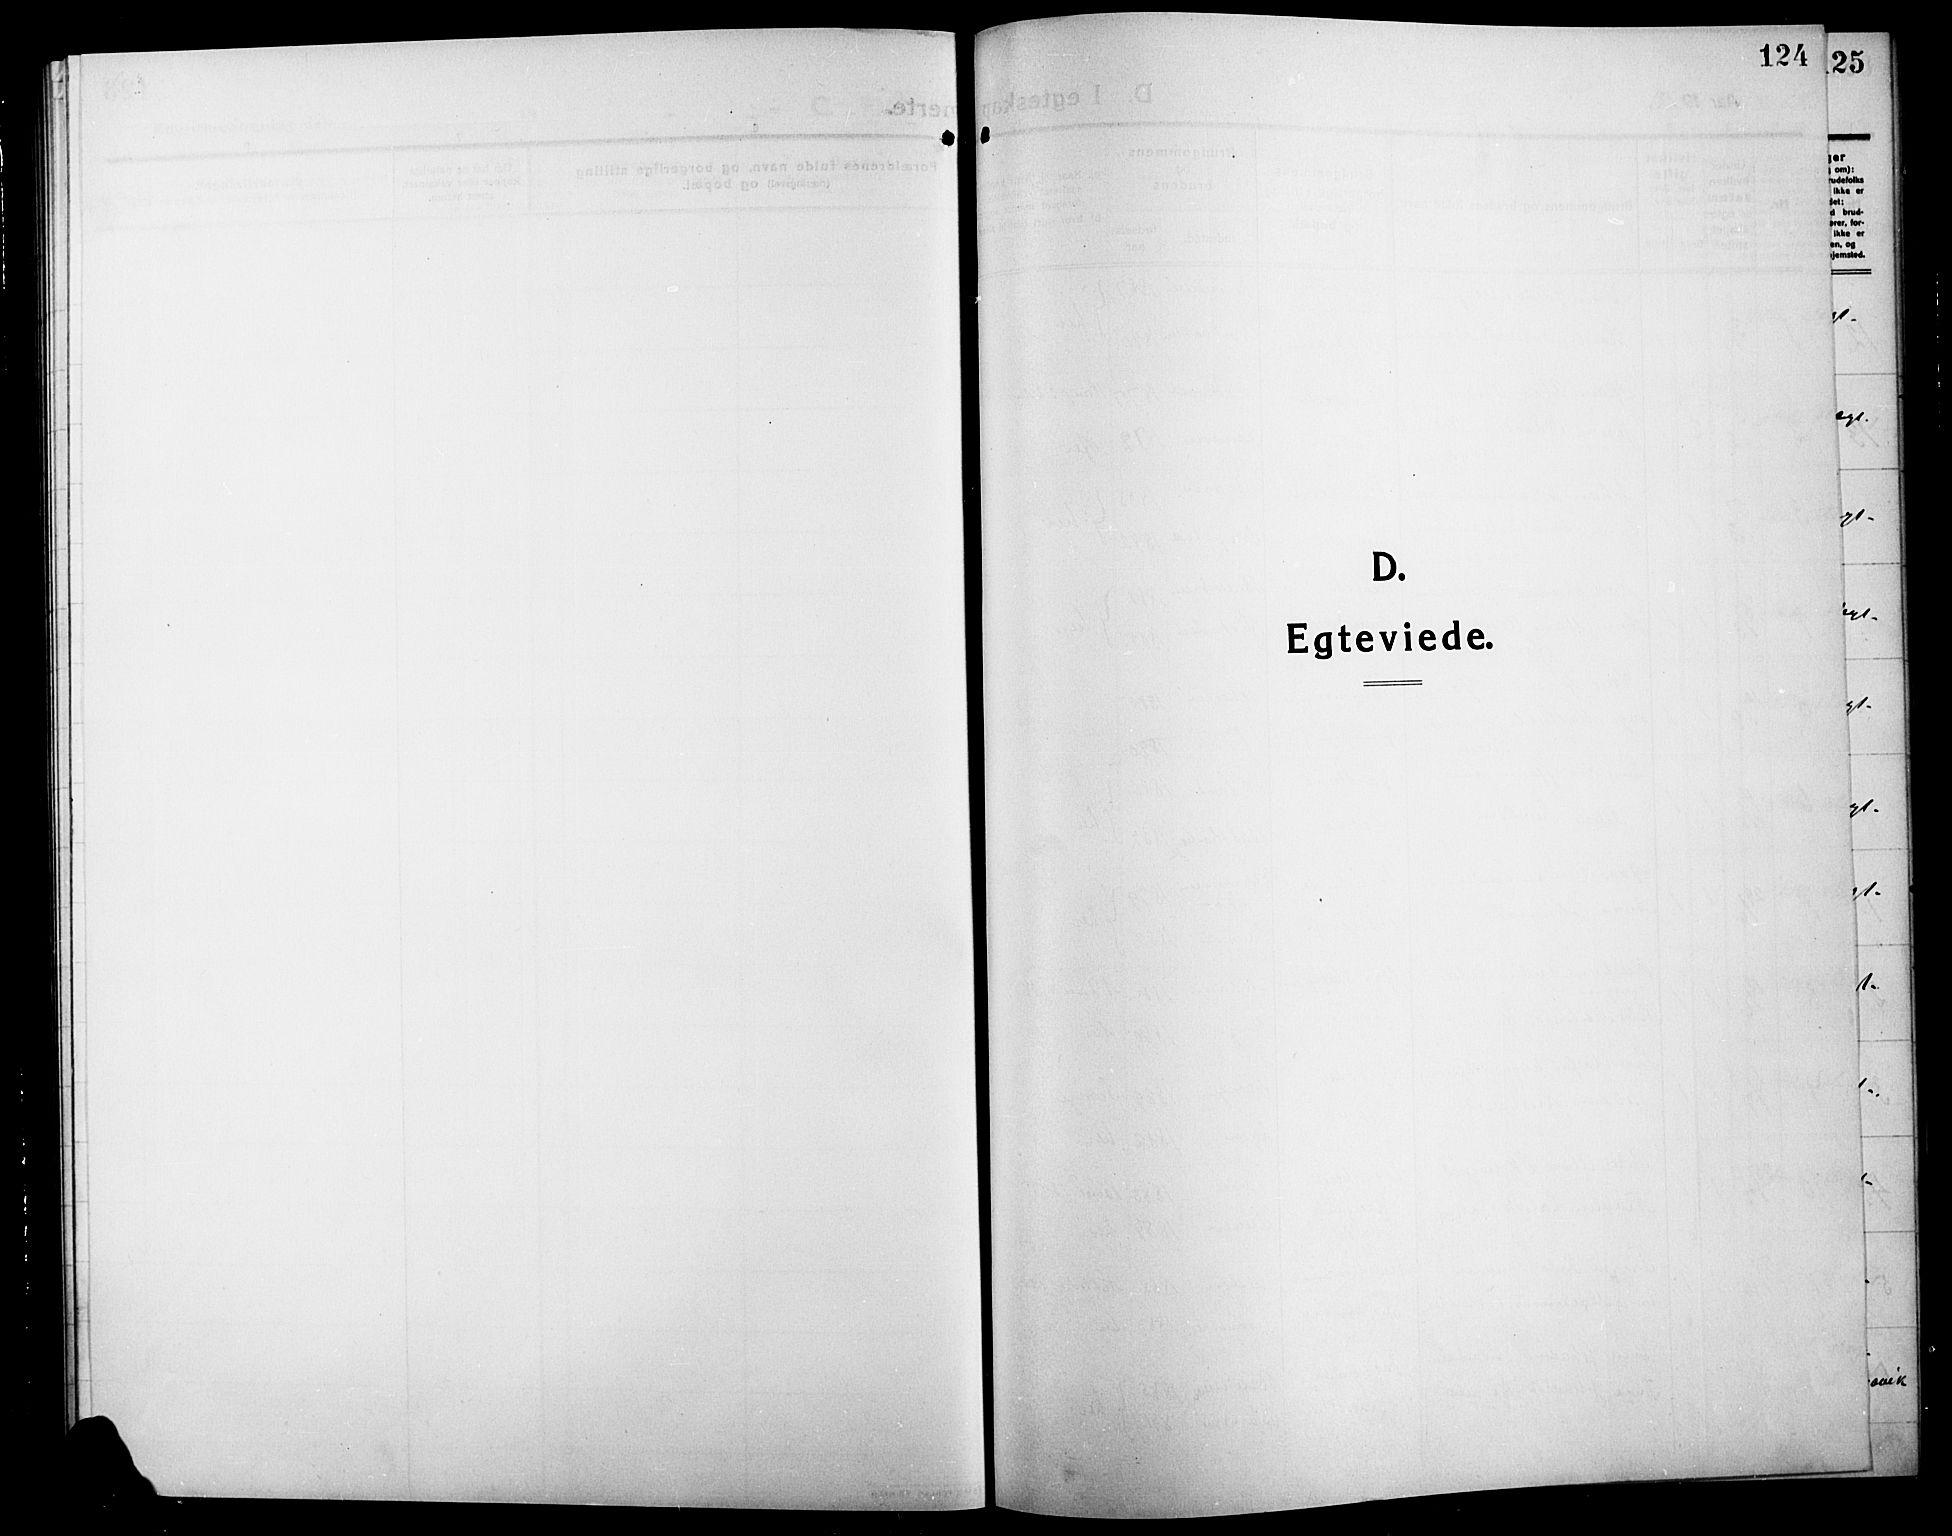 SAH, Søndre Land prestekontor, L/L0006: Klokkerbok nr. 6, 1912-1925, s. 124